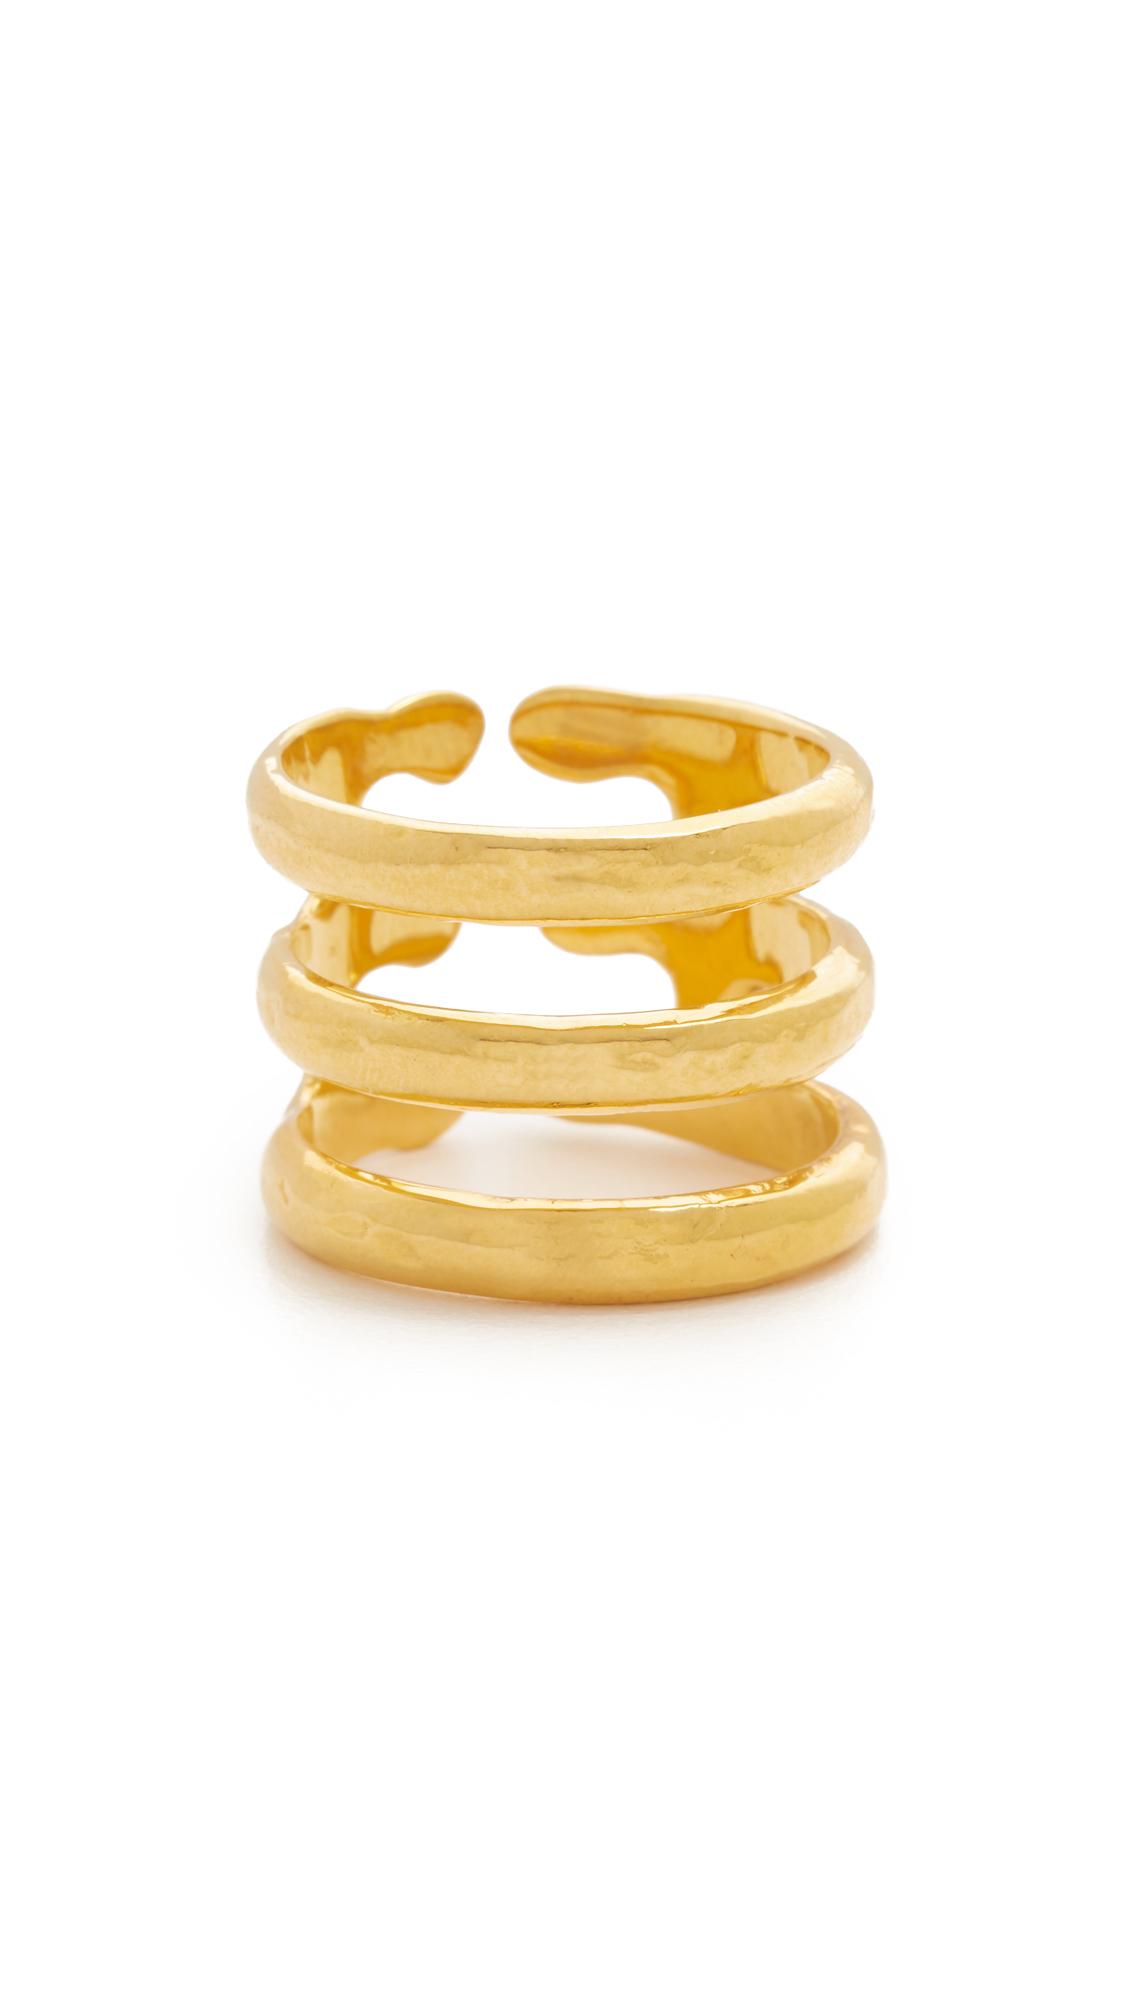 Aurelie Bidermann Esteban Ring - Gold at Shopbop